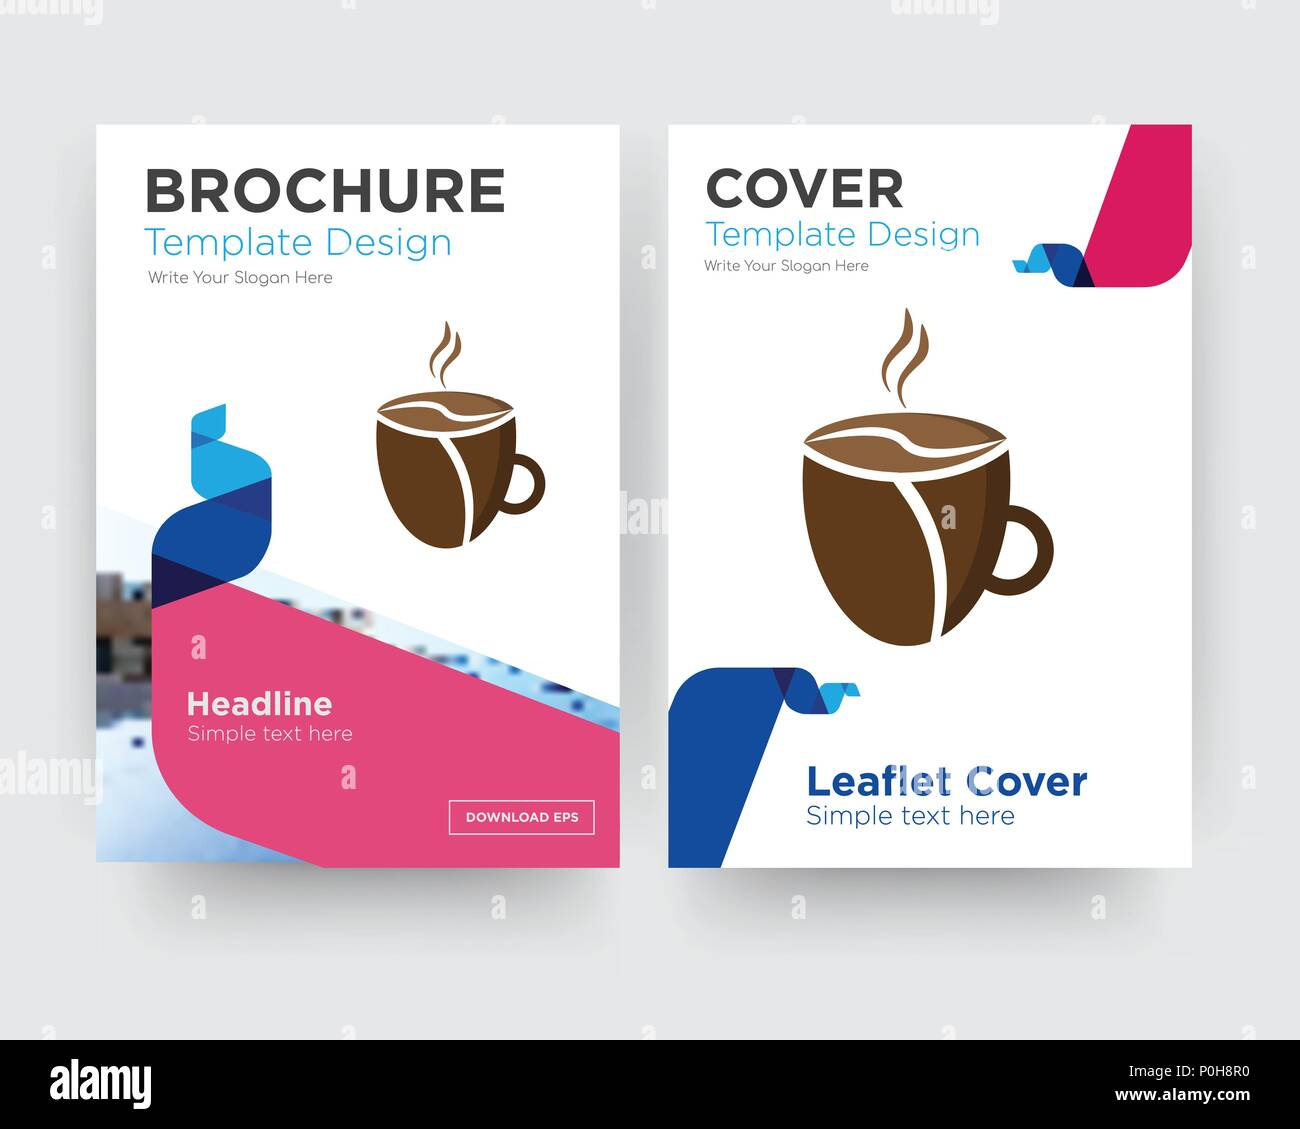 Modele De Conception De Brochure Flyer Cafeteria Avec Resume Photo